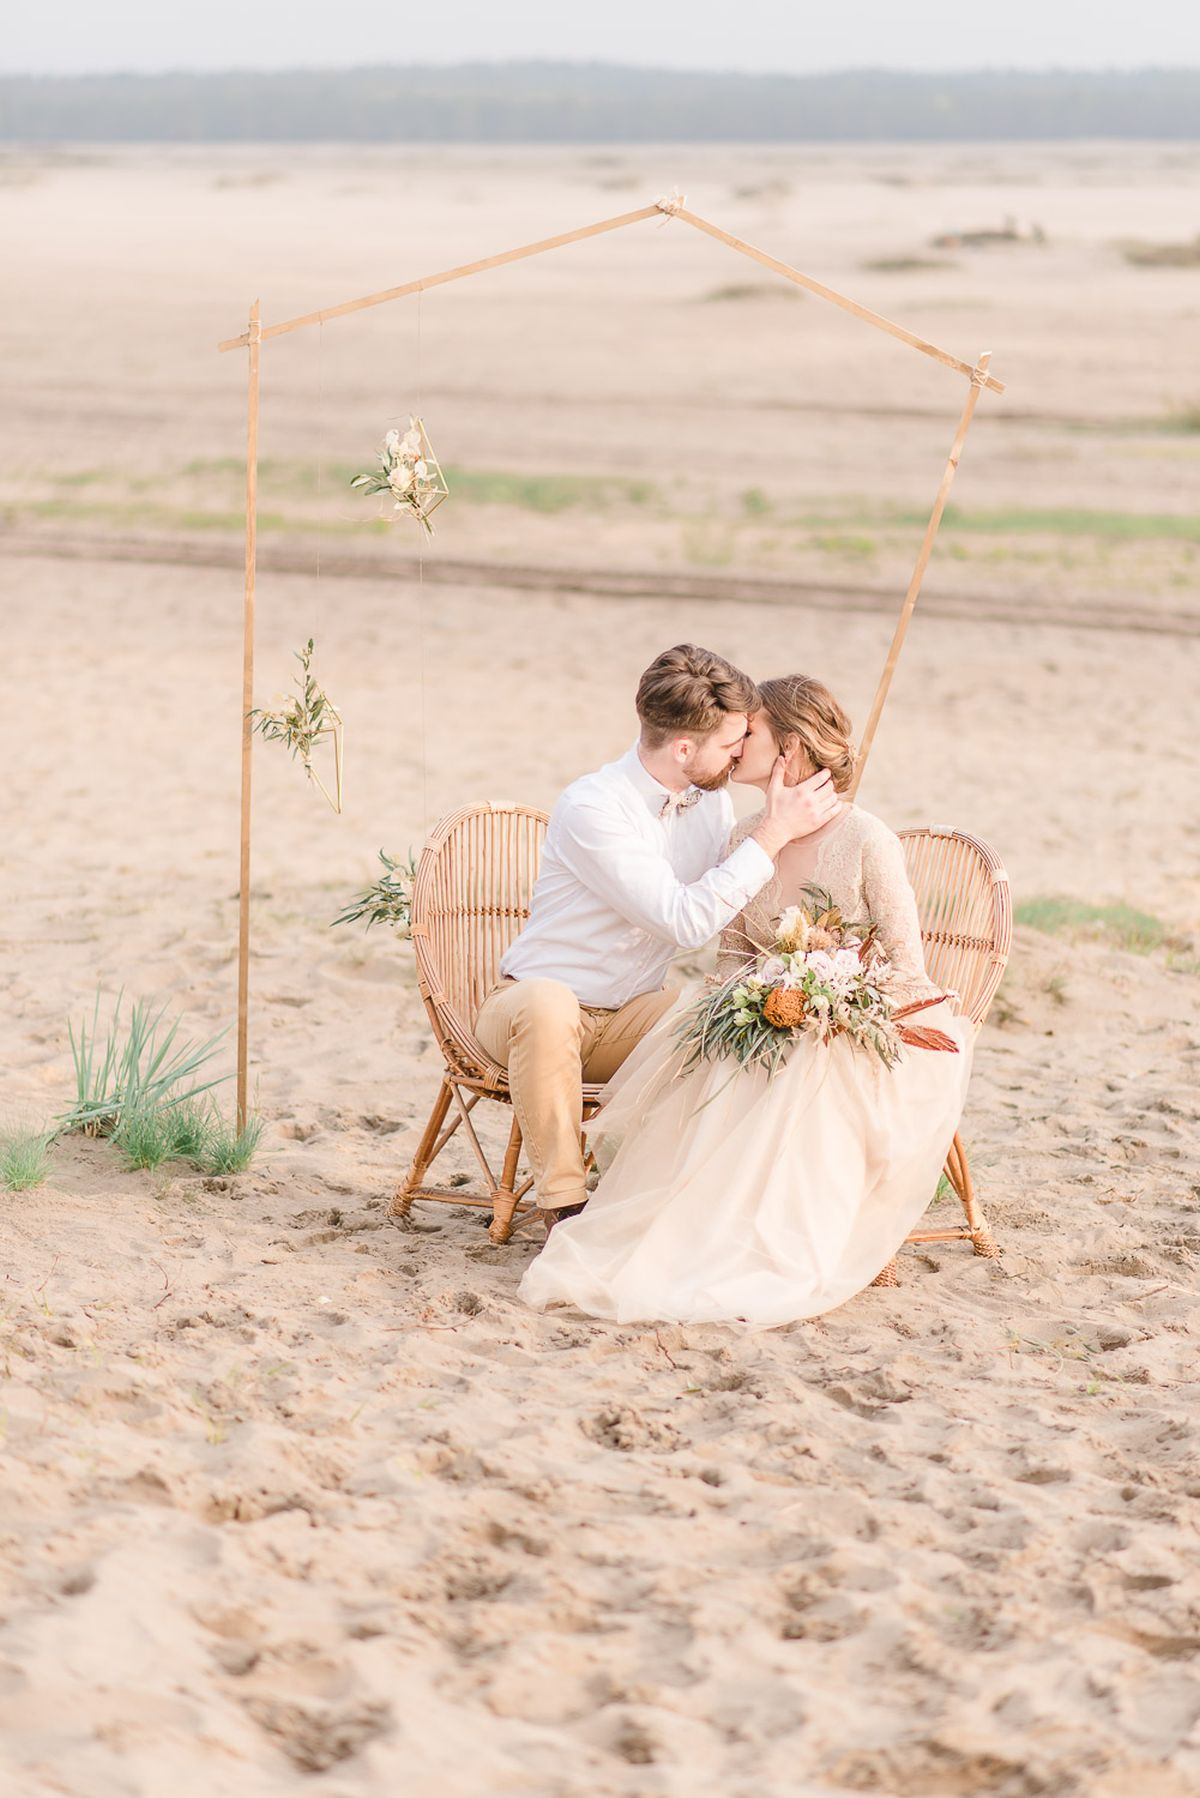 aschaaa-photography-wedding-shoot-wüste (103)